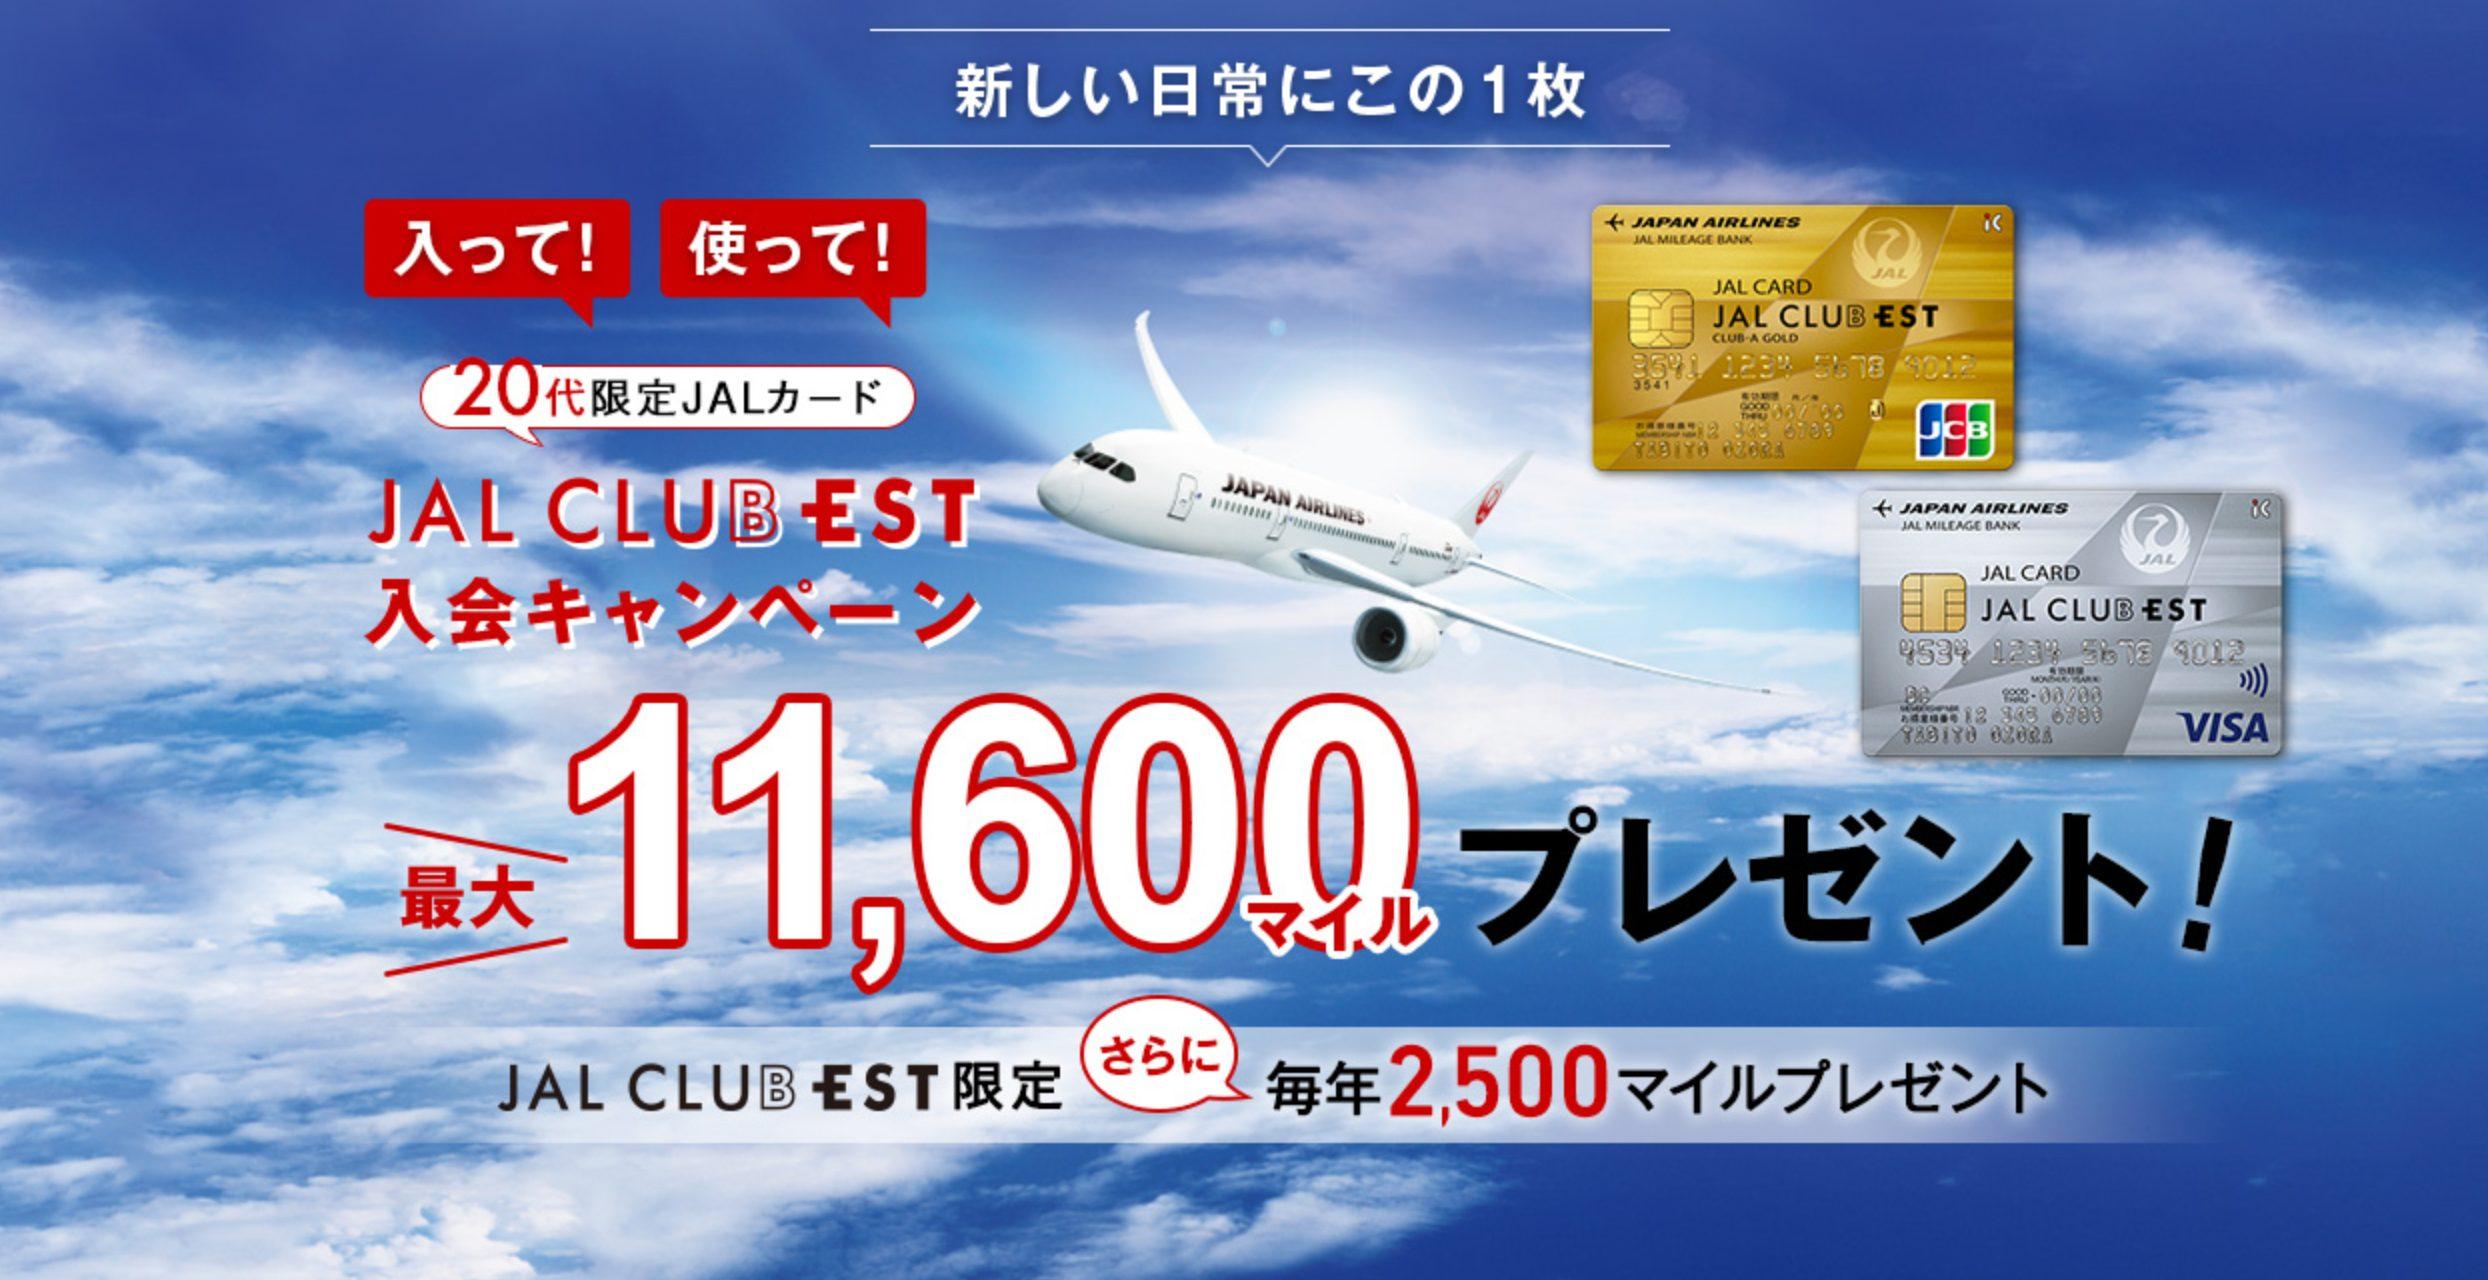 JAL CLUB ESTの入会キャンペーン